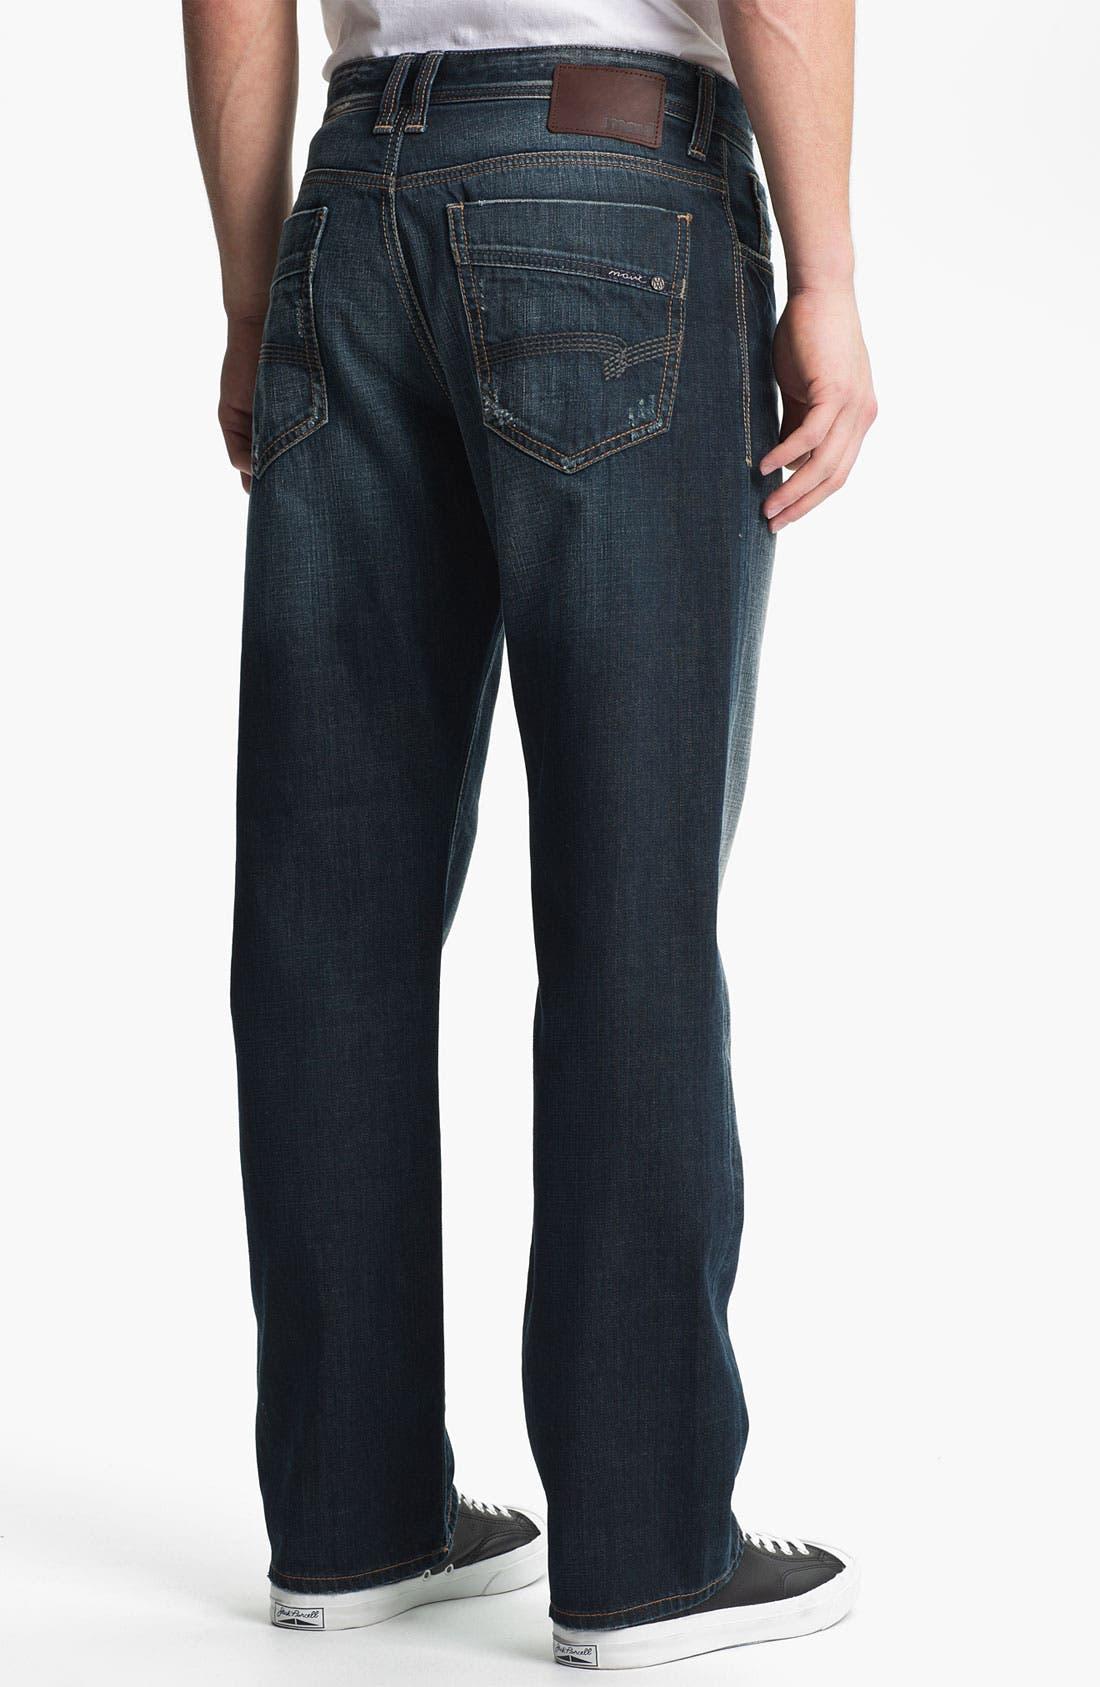 Alternate Image 1 Selected - Mavi Jeans 'Matt' Relaxed Straight Leg Jeans (Used American Vintage)